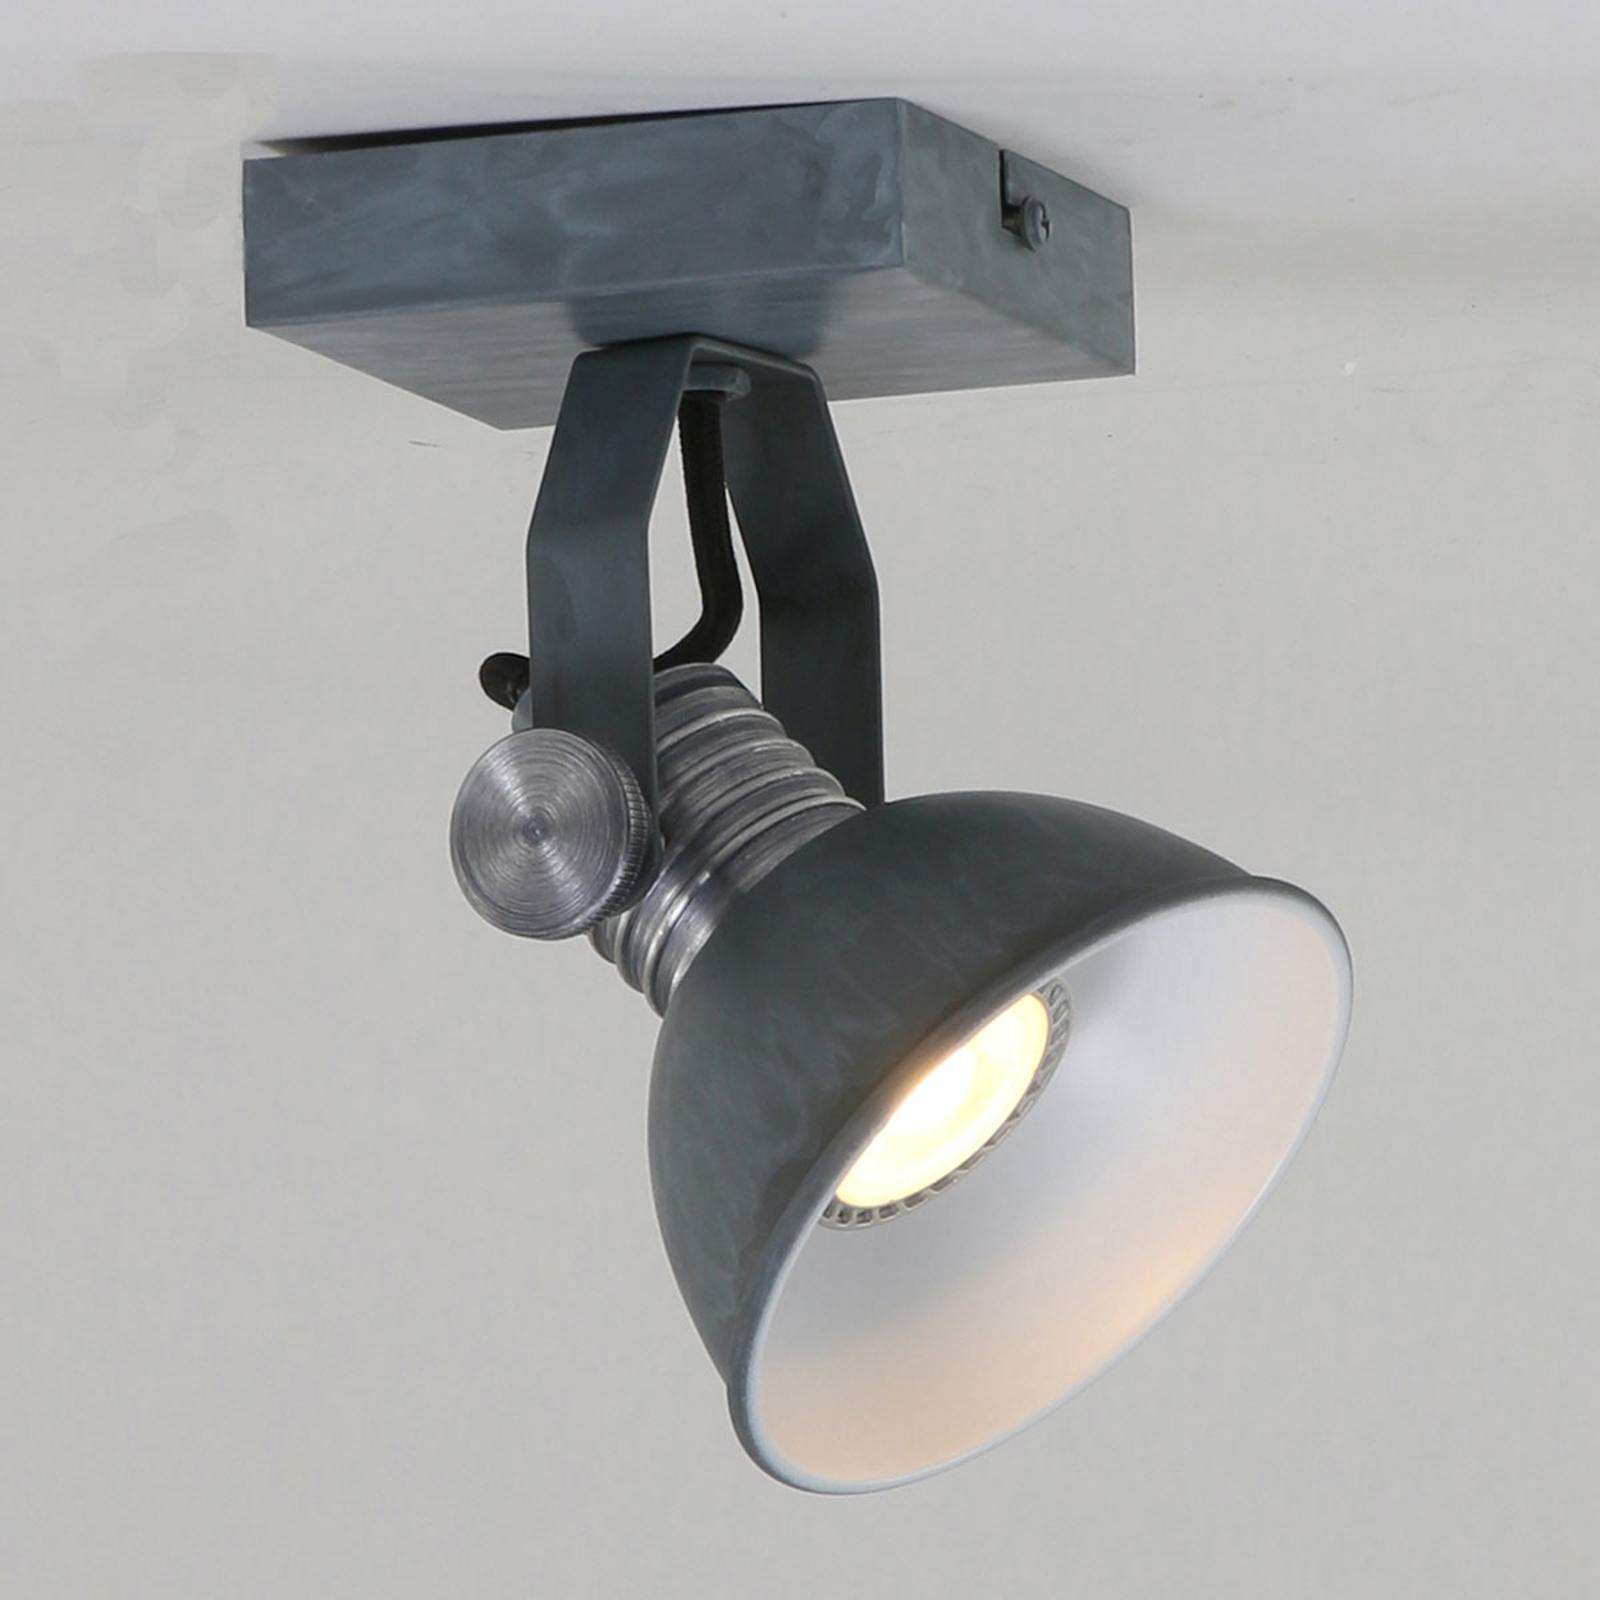 LED-veggspot Brooklyn 1 lyskilde grå